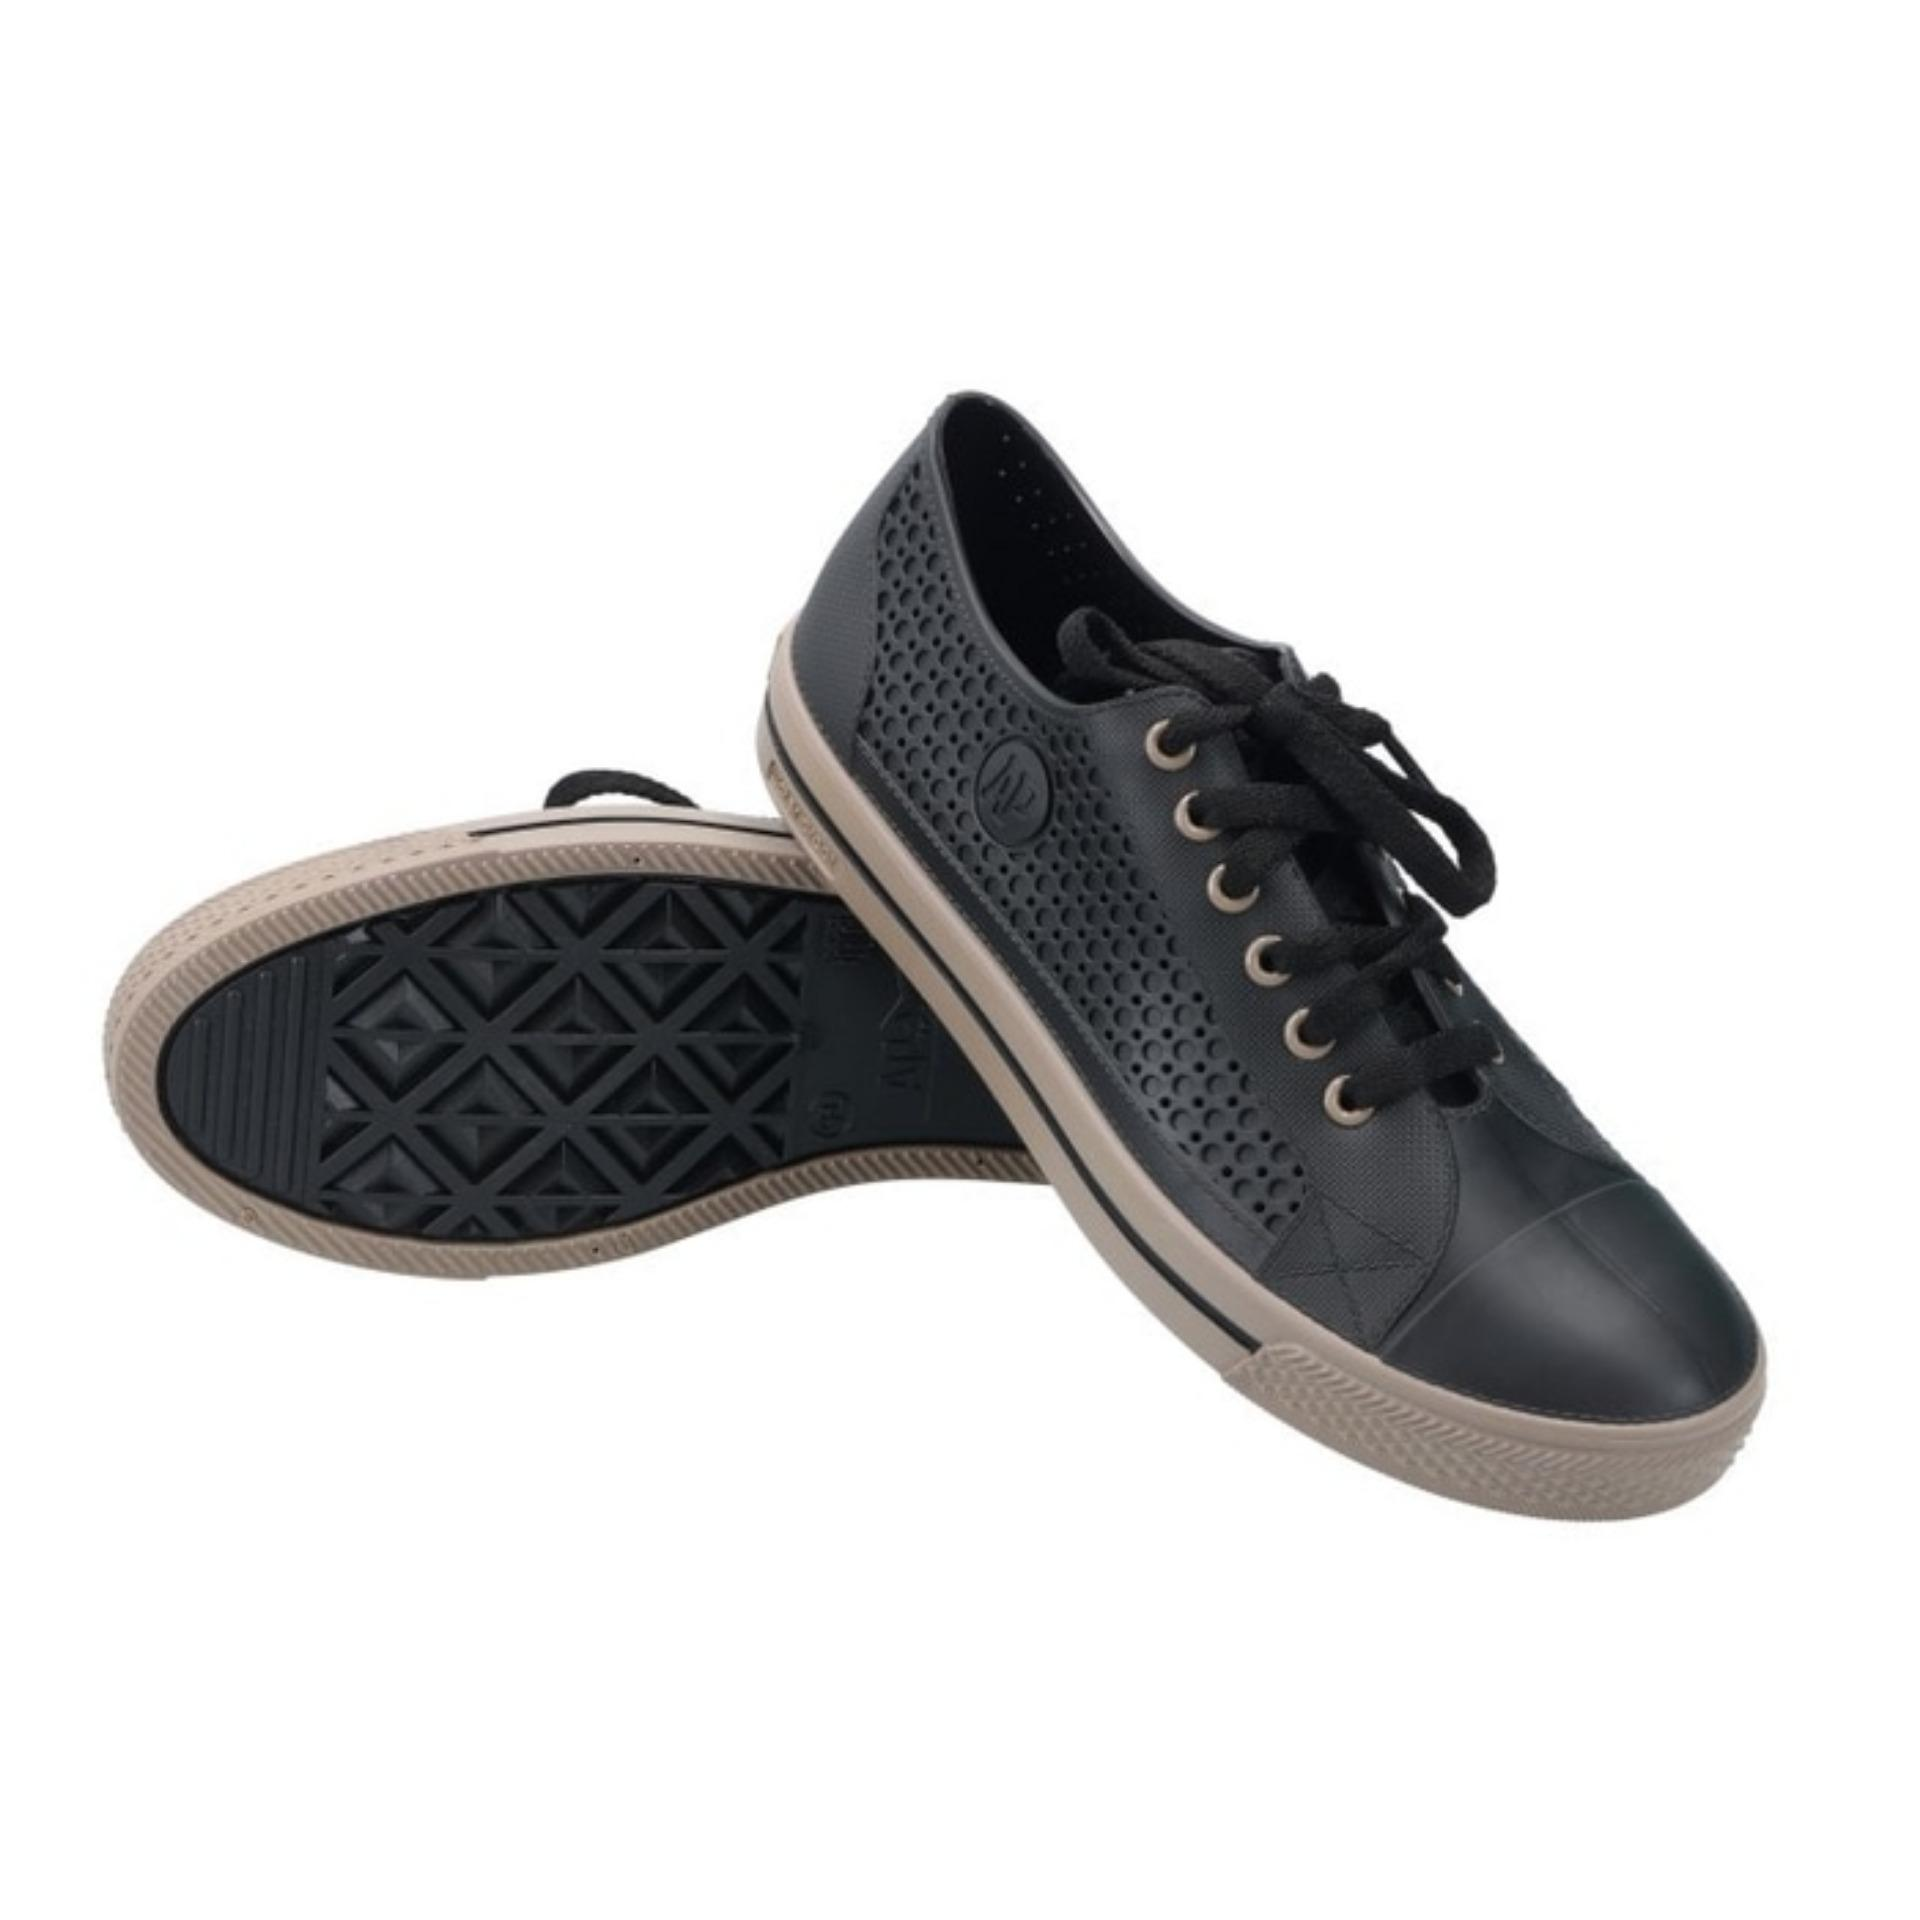 76a8bd6571e05cb14ed270c1150950d1 Review Daftar Harga Sepatu Converse Flexi Terlaris saat ini